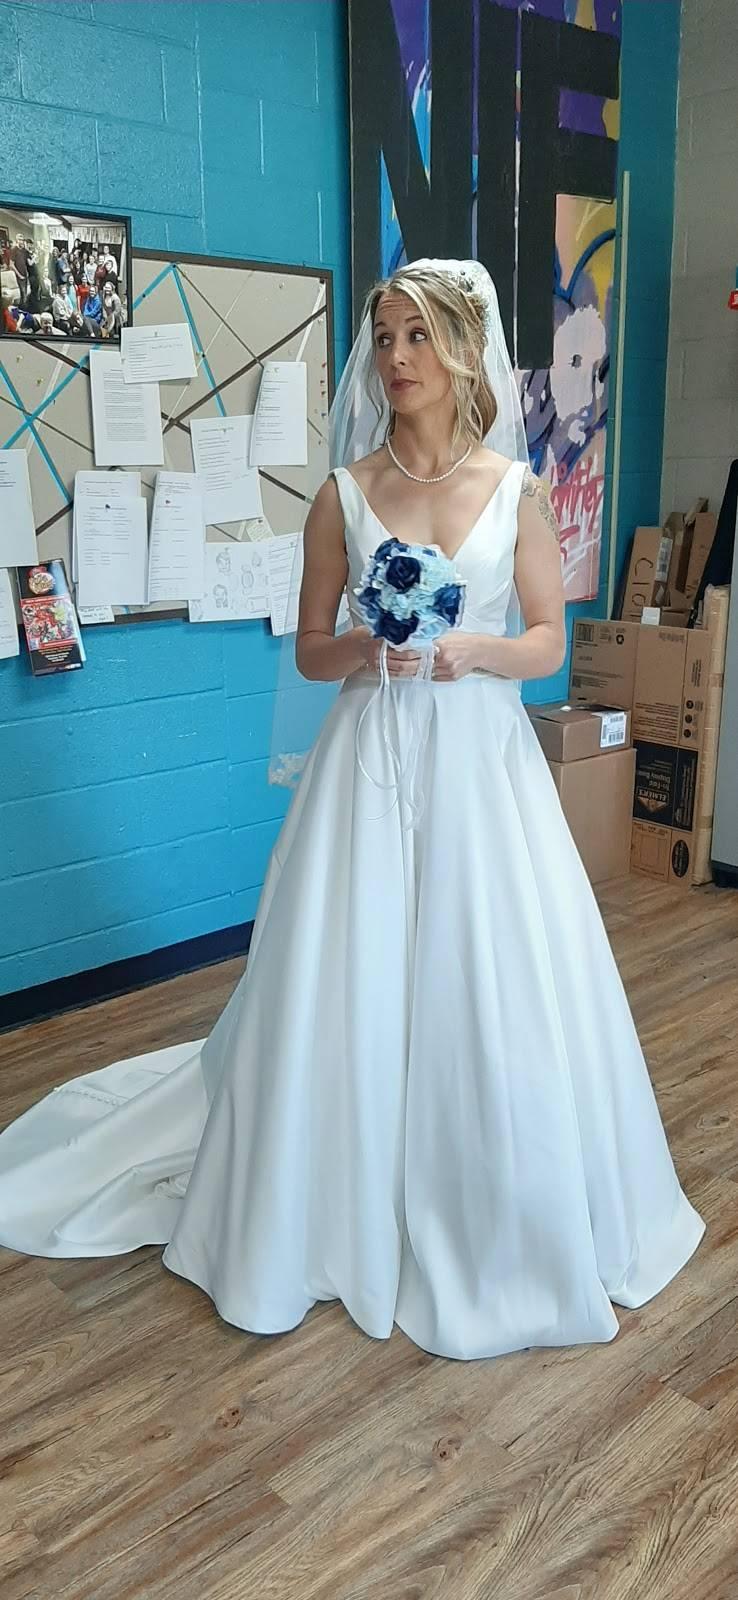 Breathless Bridal - clothing store    Photo 5 of 6   Address: 1741 US-41, Ridgetop, TN 37152, USA   Phone: (615) 855-0644